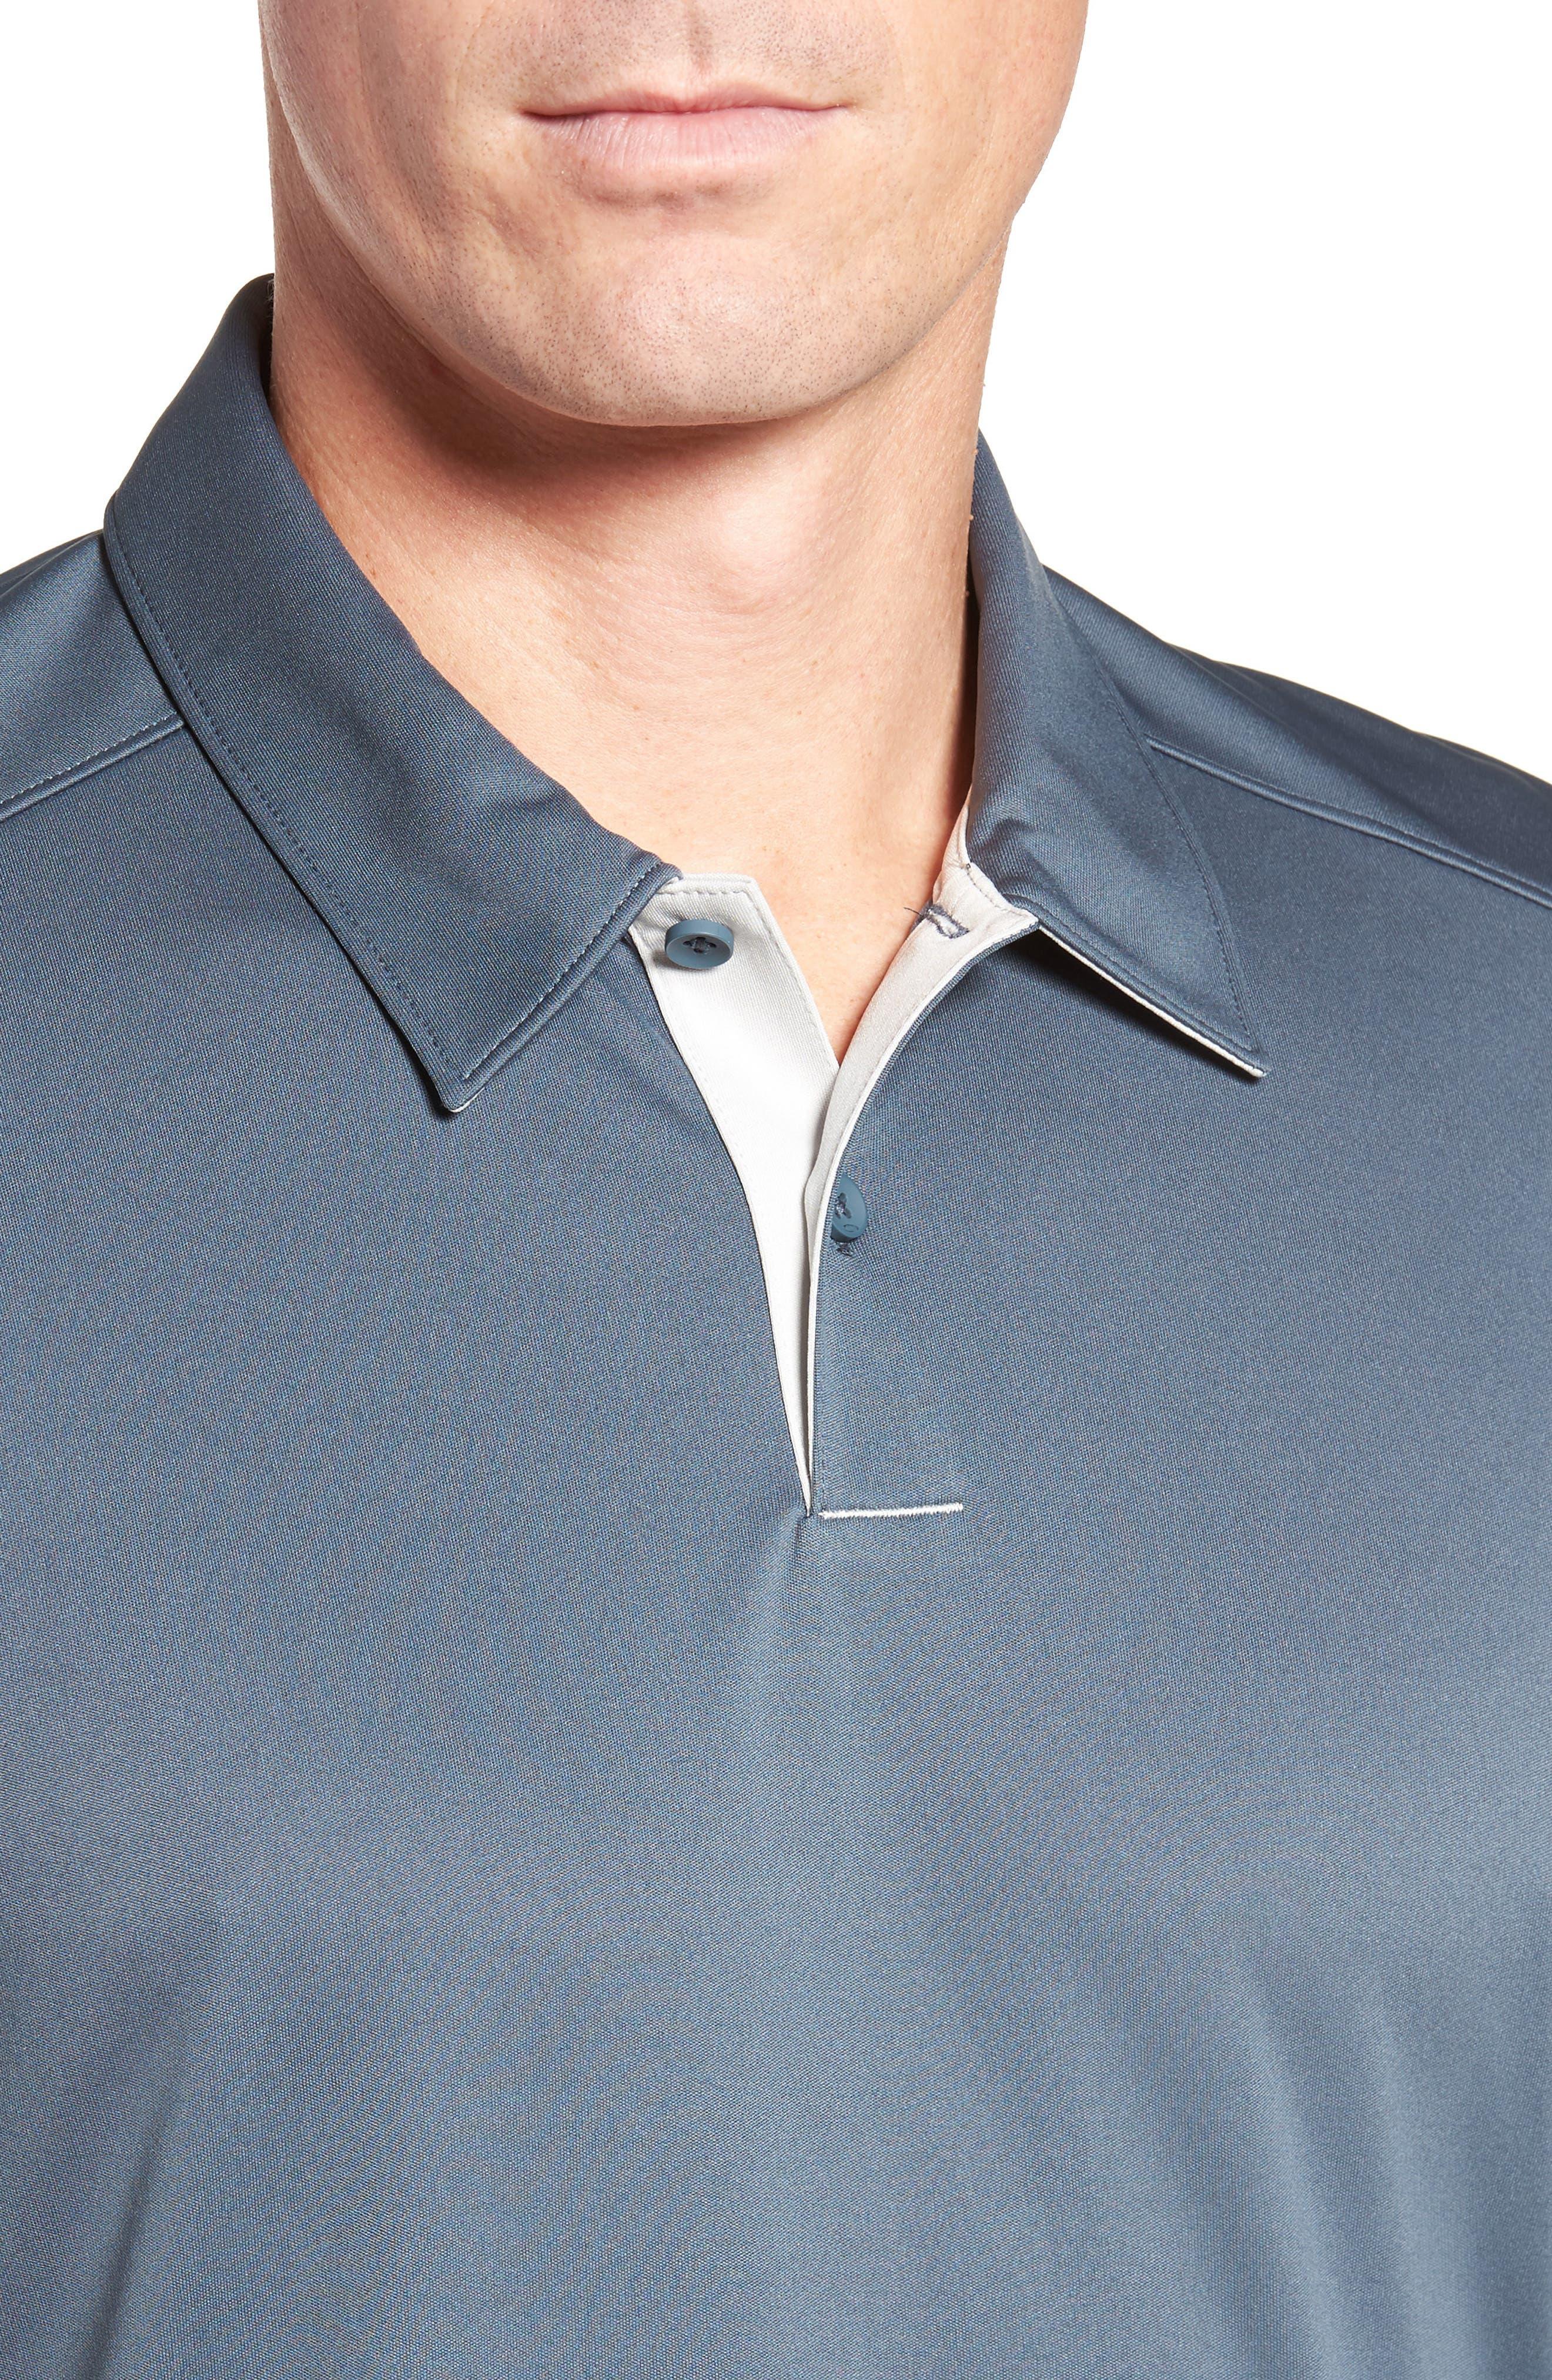 Divisional Polo Shirt,                             Alternate thumbnail 4, color,                             DARK SLATE